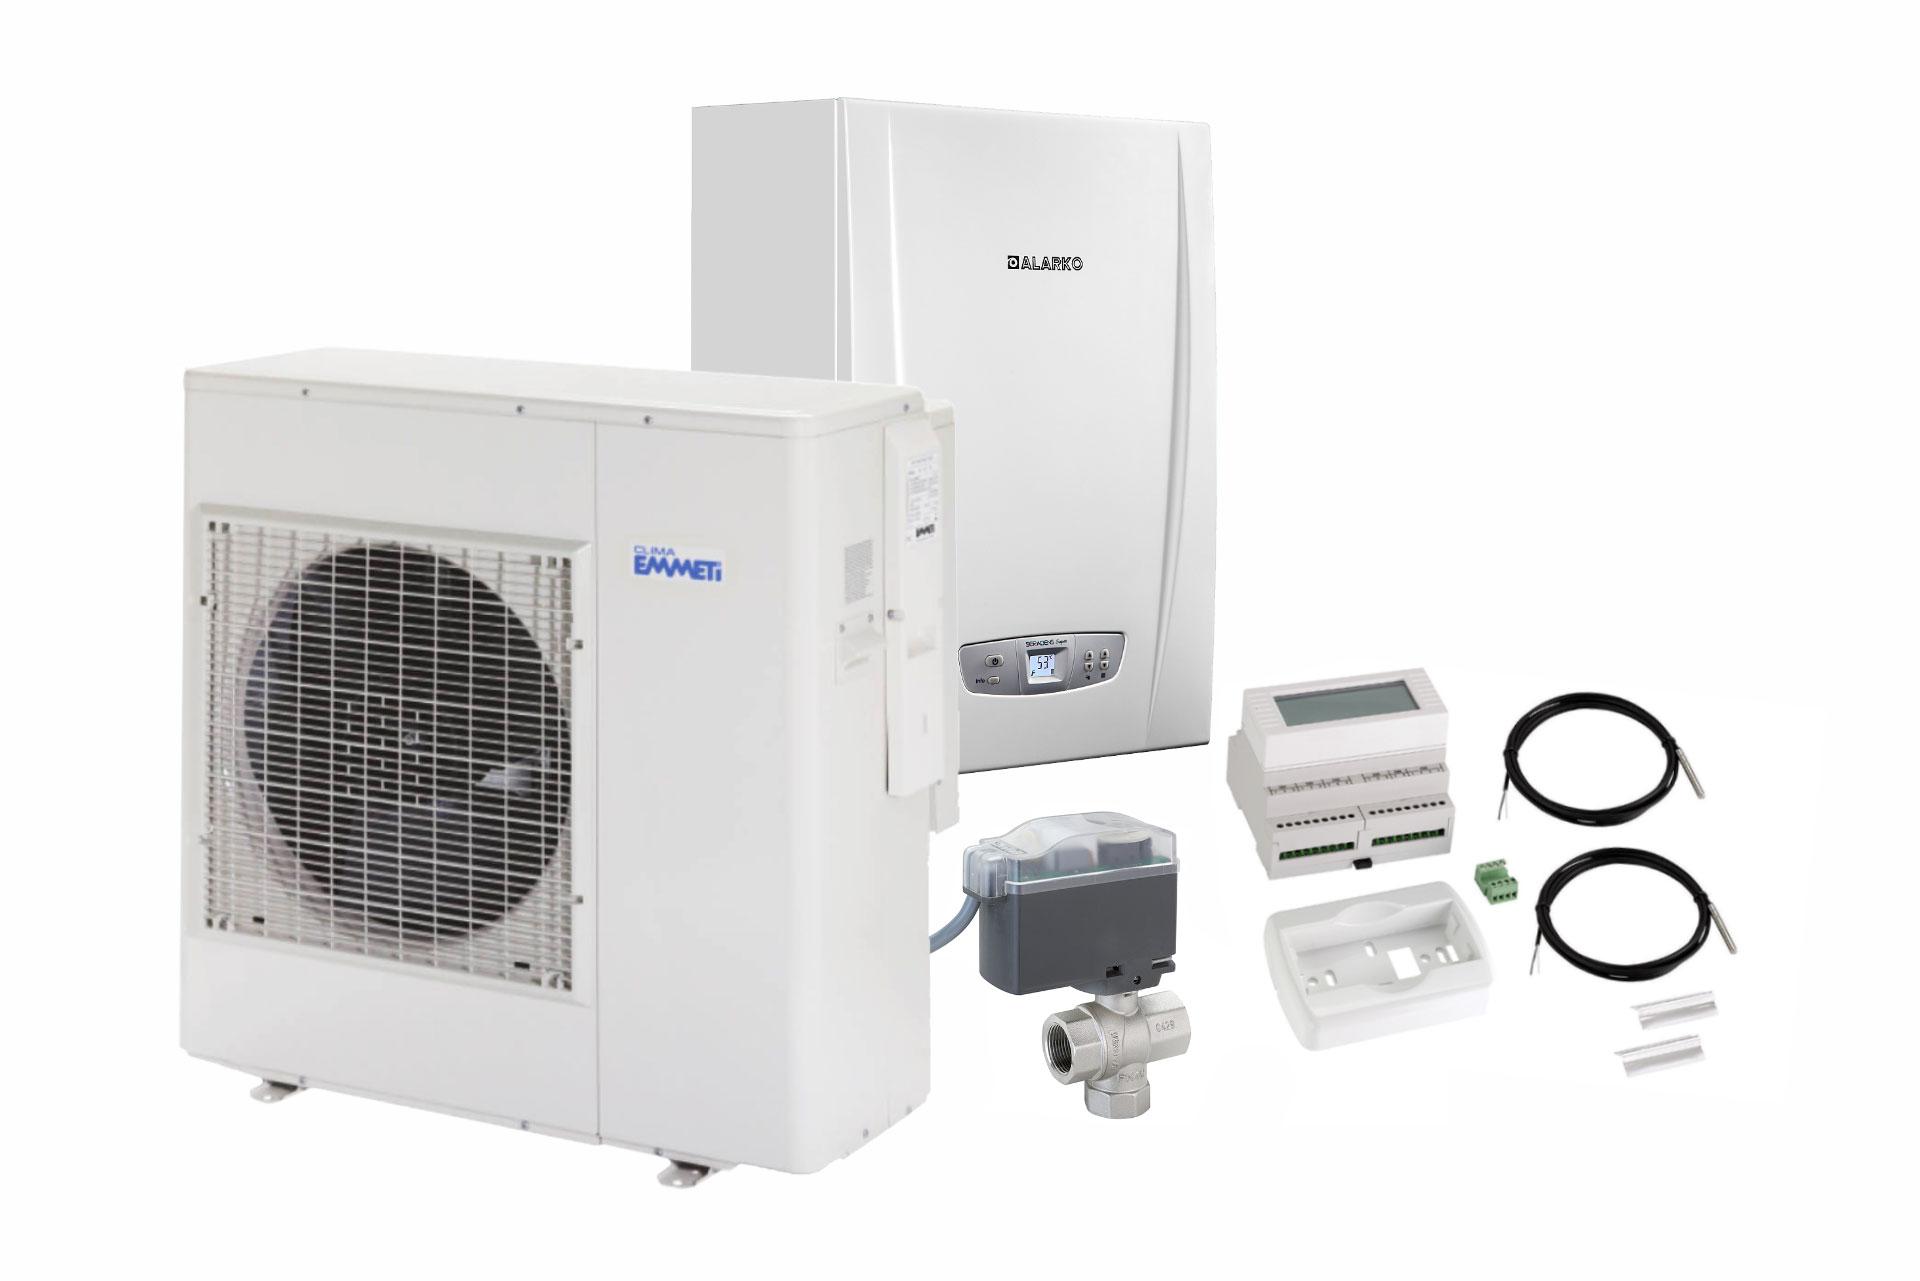 EcoSmart-Hybrid-sistems-06_2019-new